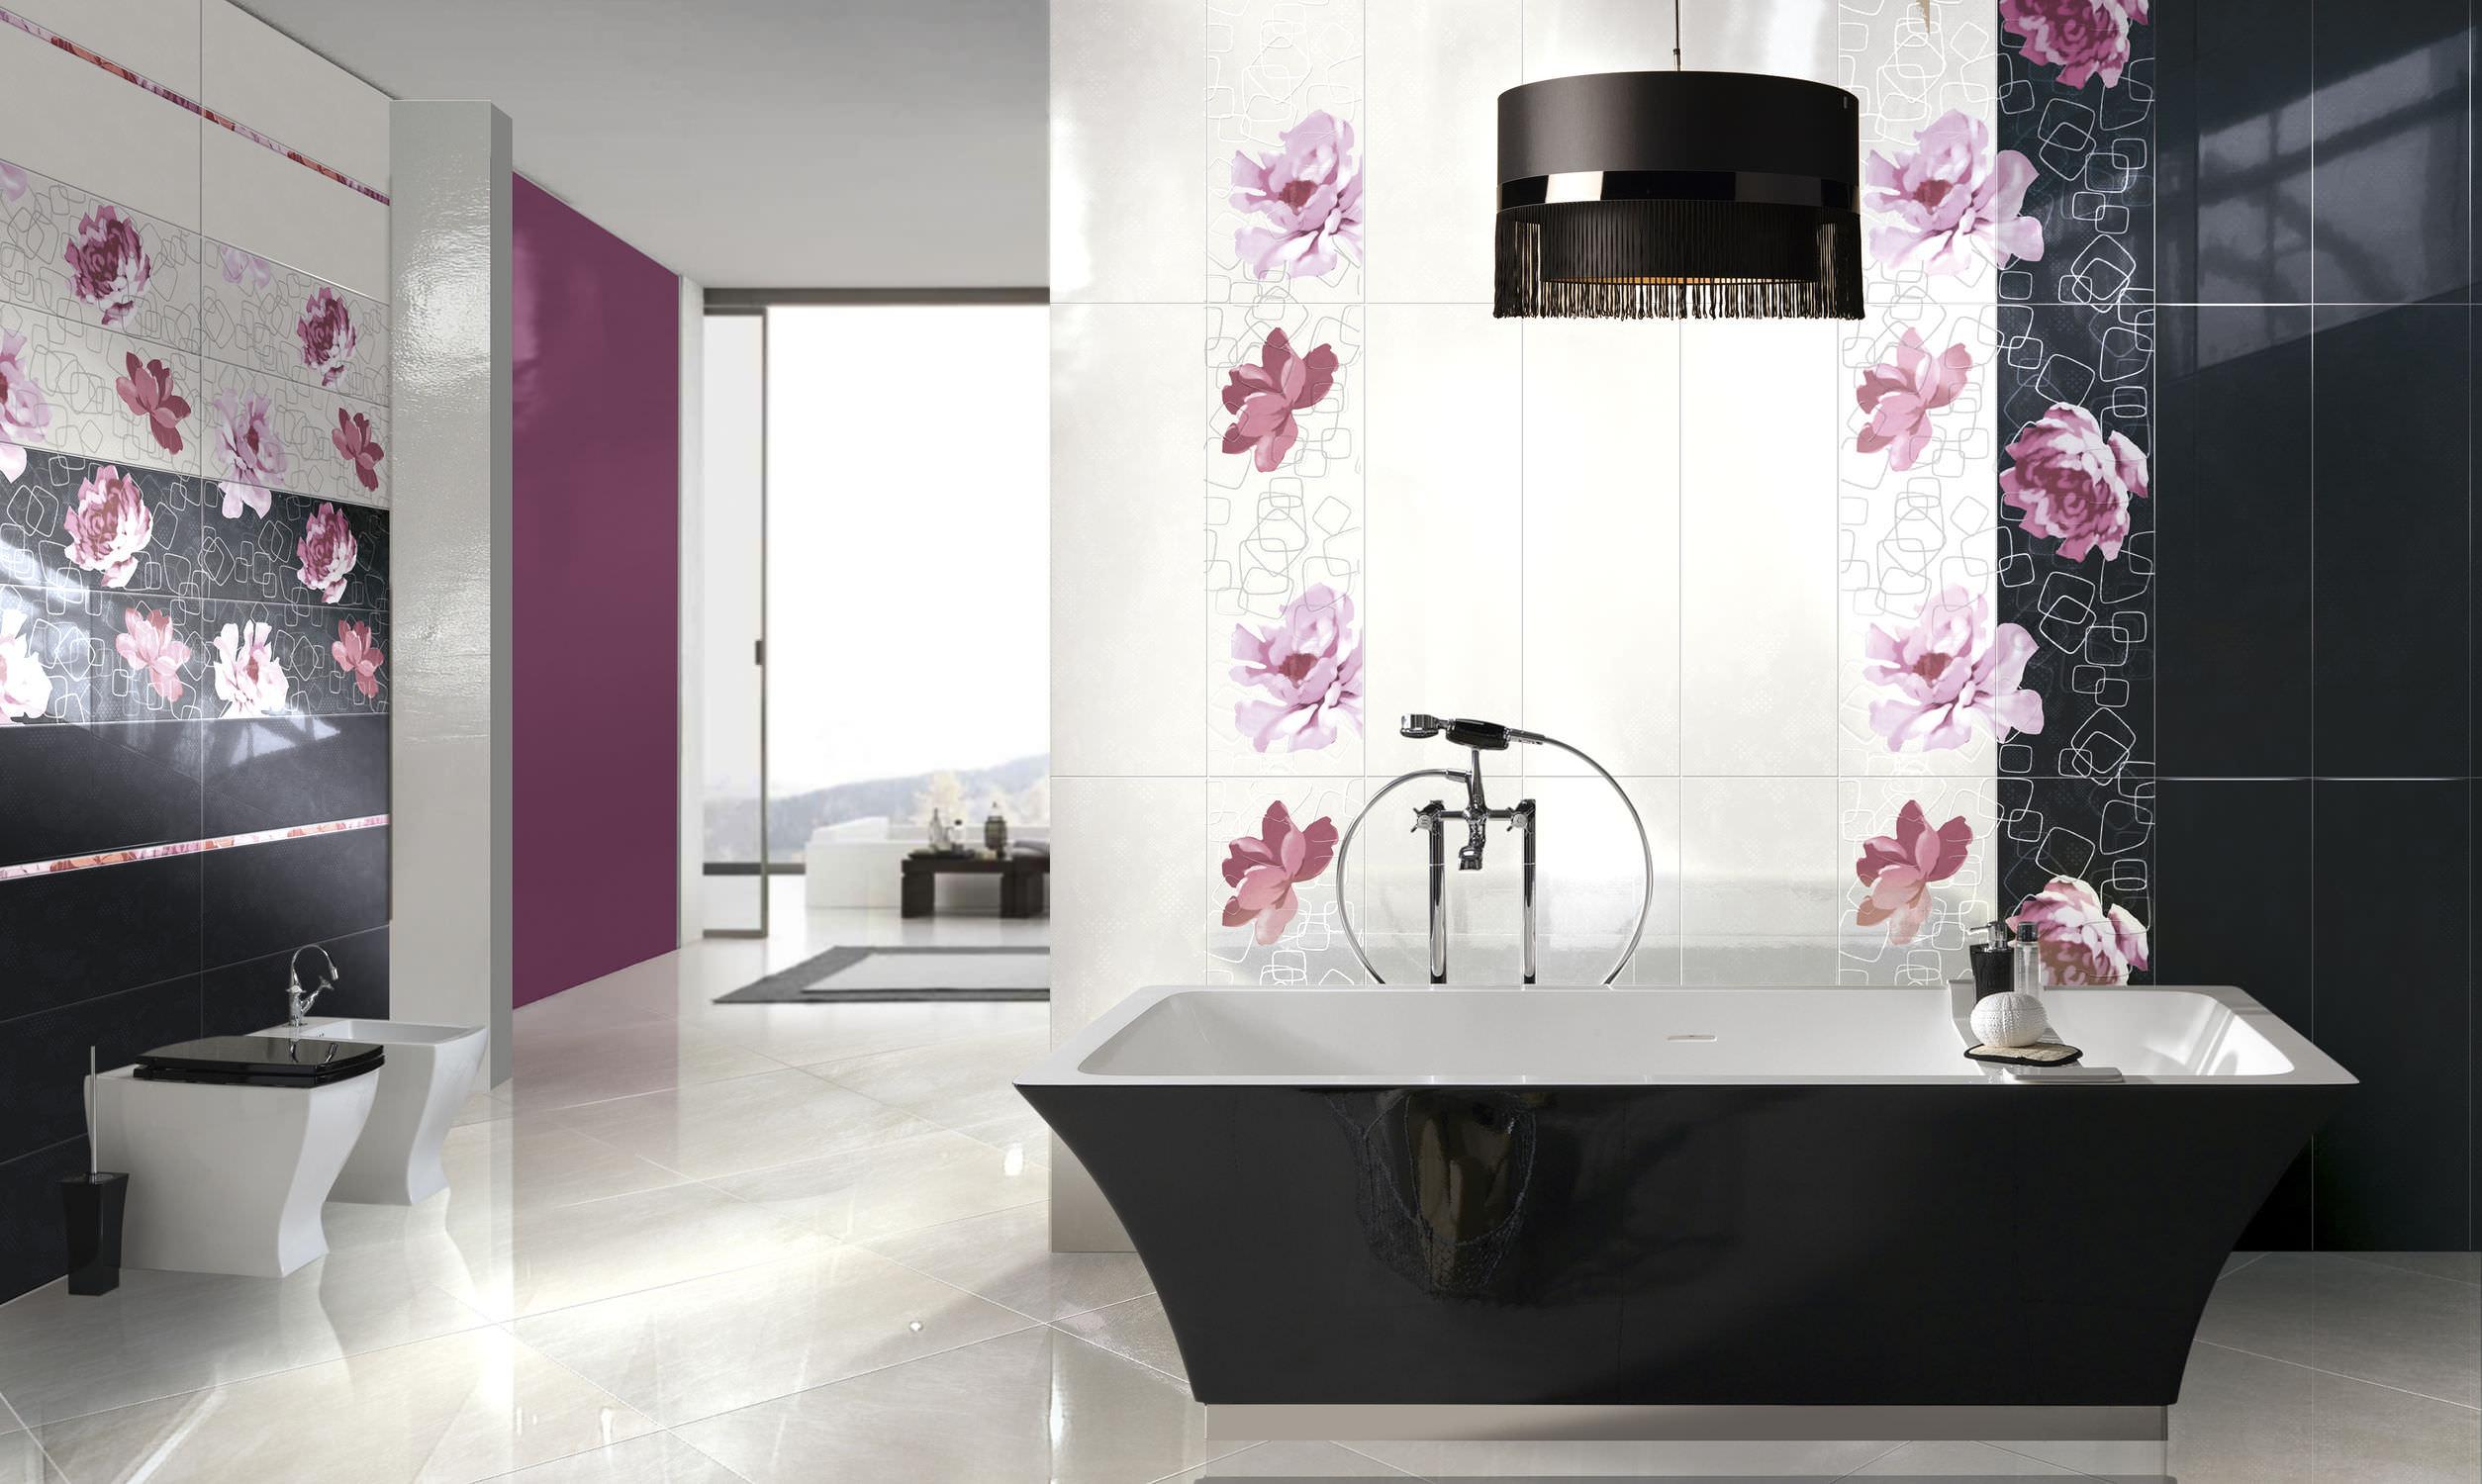 Piastrella da bagno da pavimento in gres porcellanato a tinta